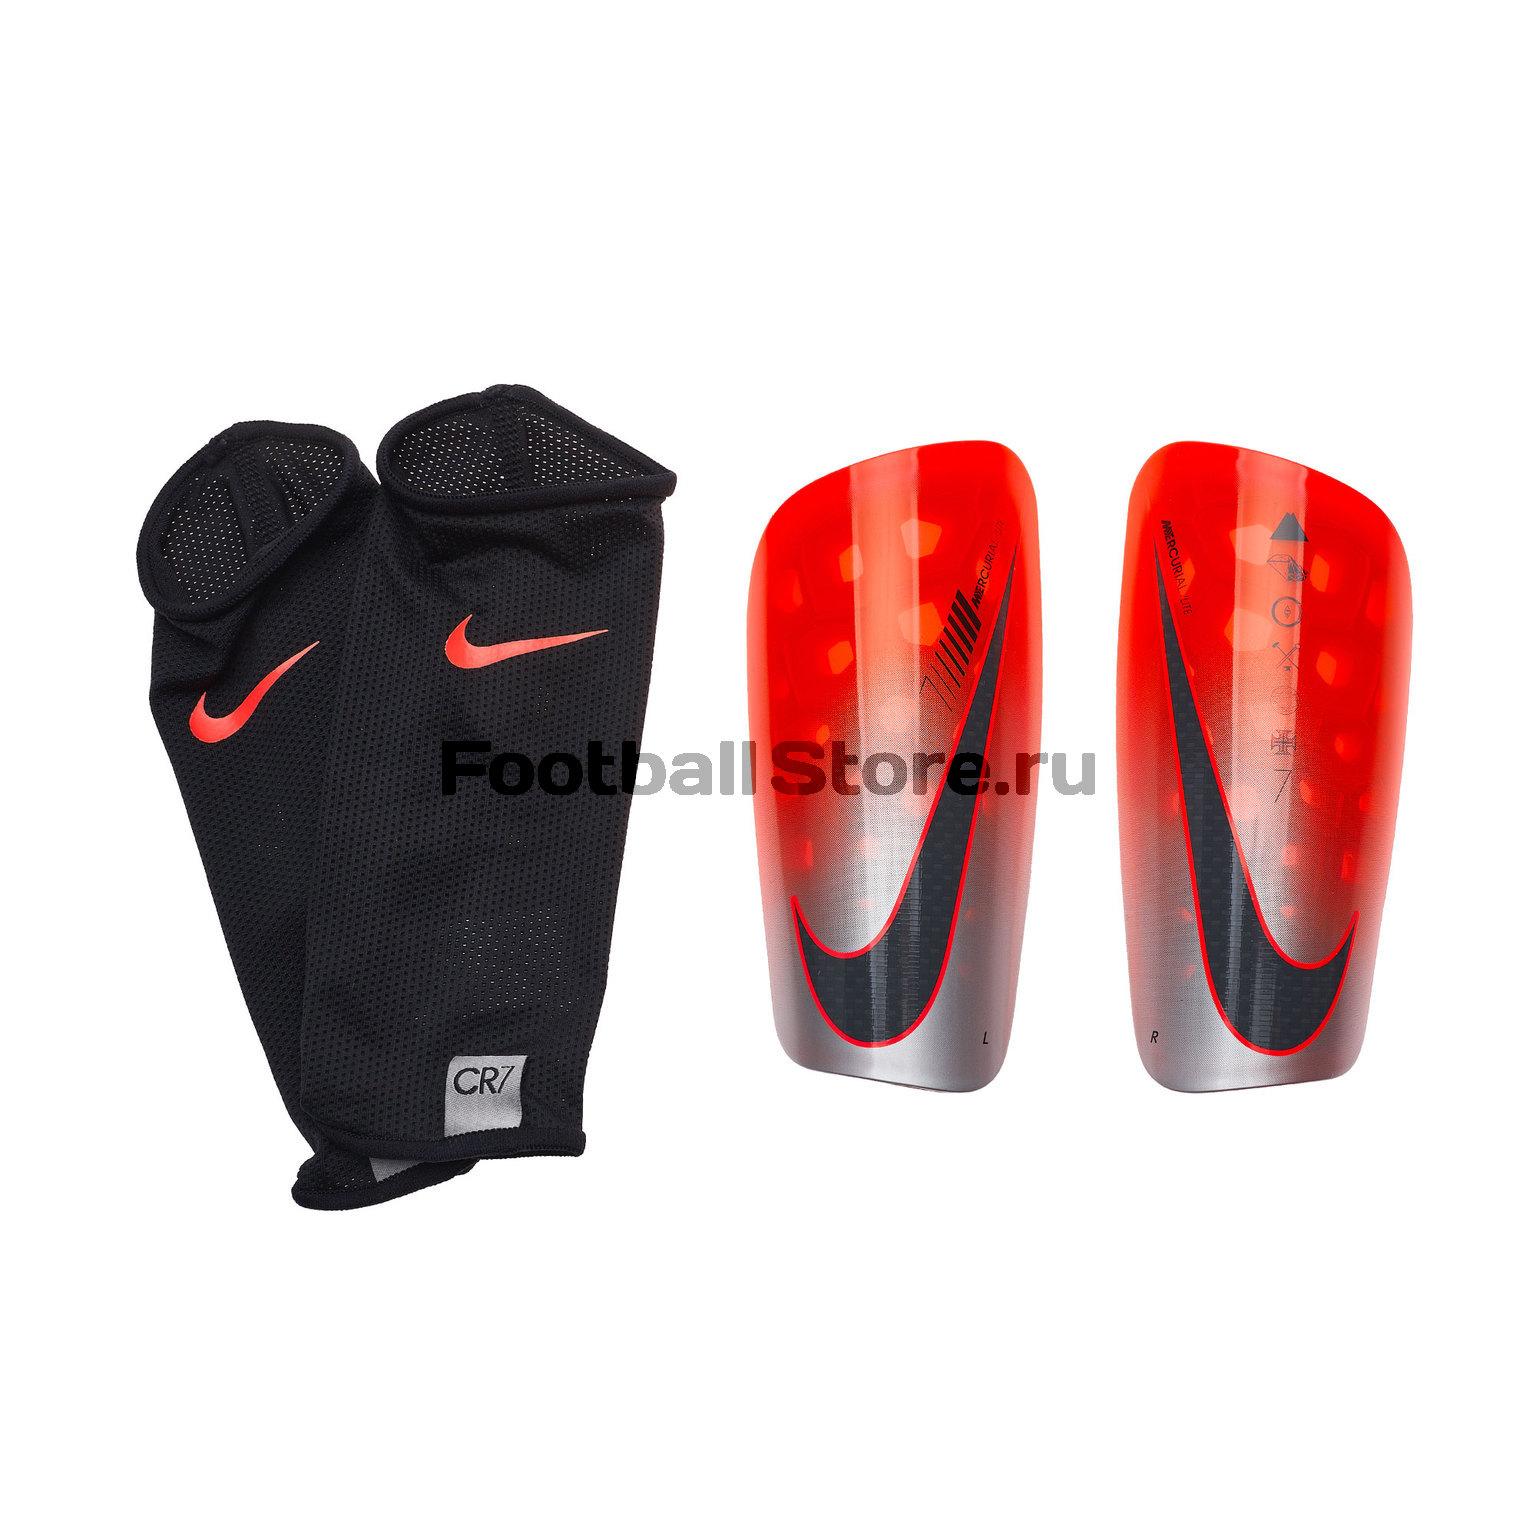 Щитки Nike CR7 Mercurial Lite SP2158-620